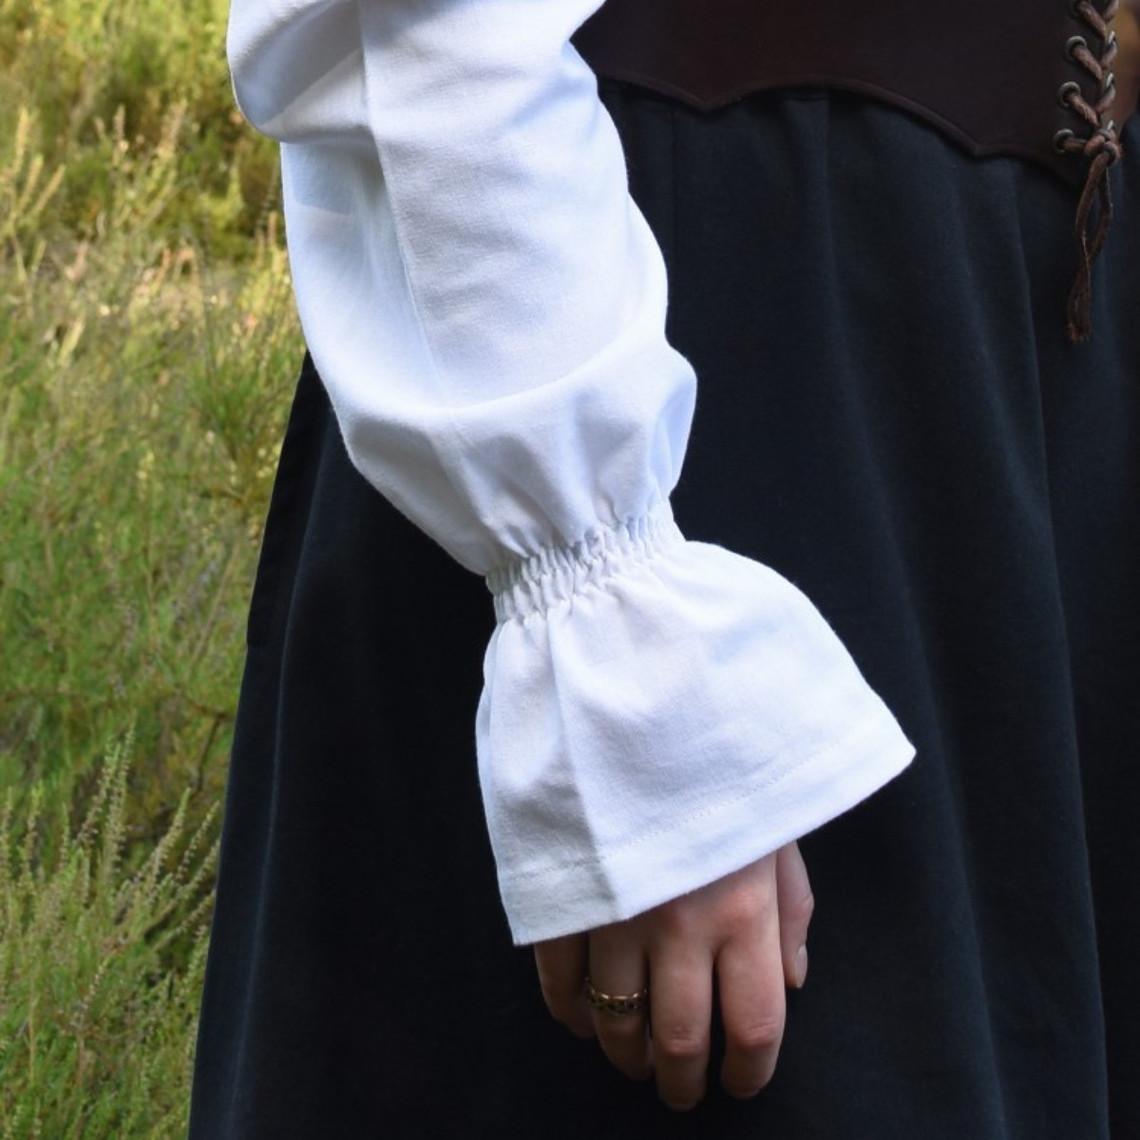 Renaissancebluse Elisabeth, weiß